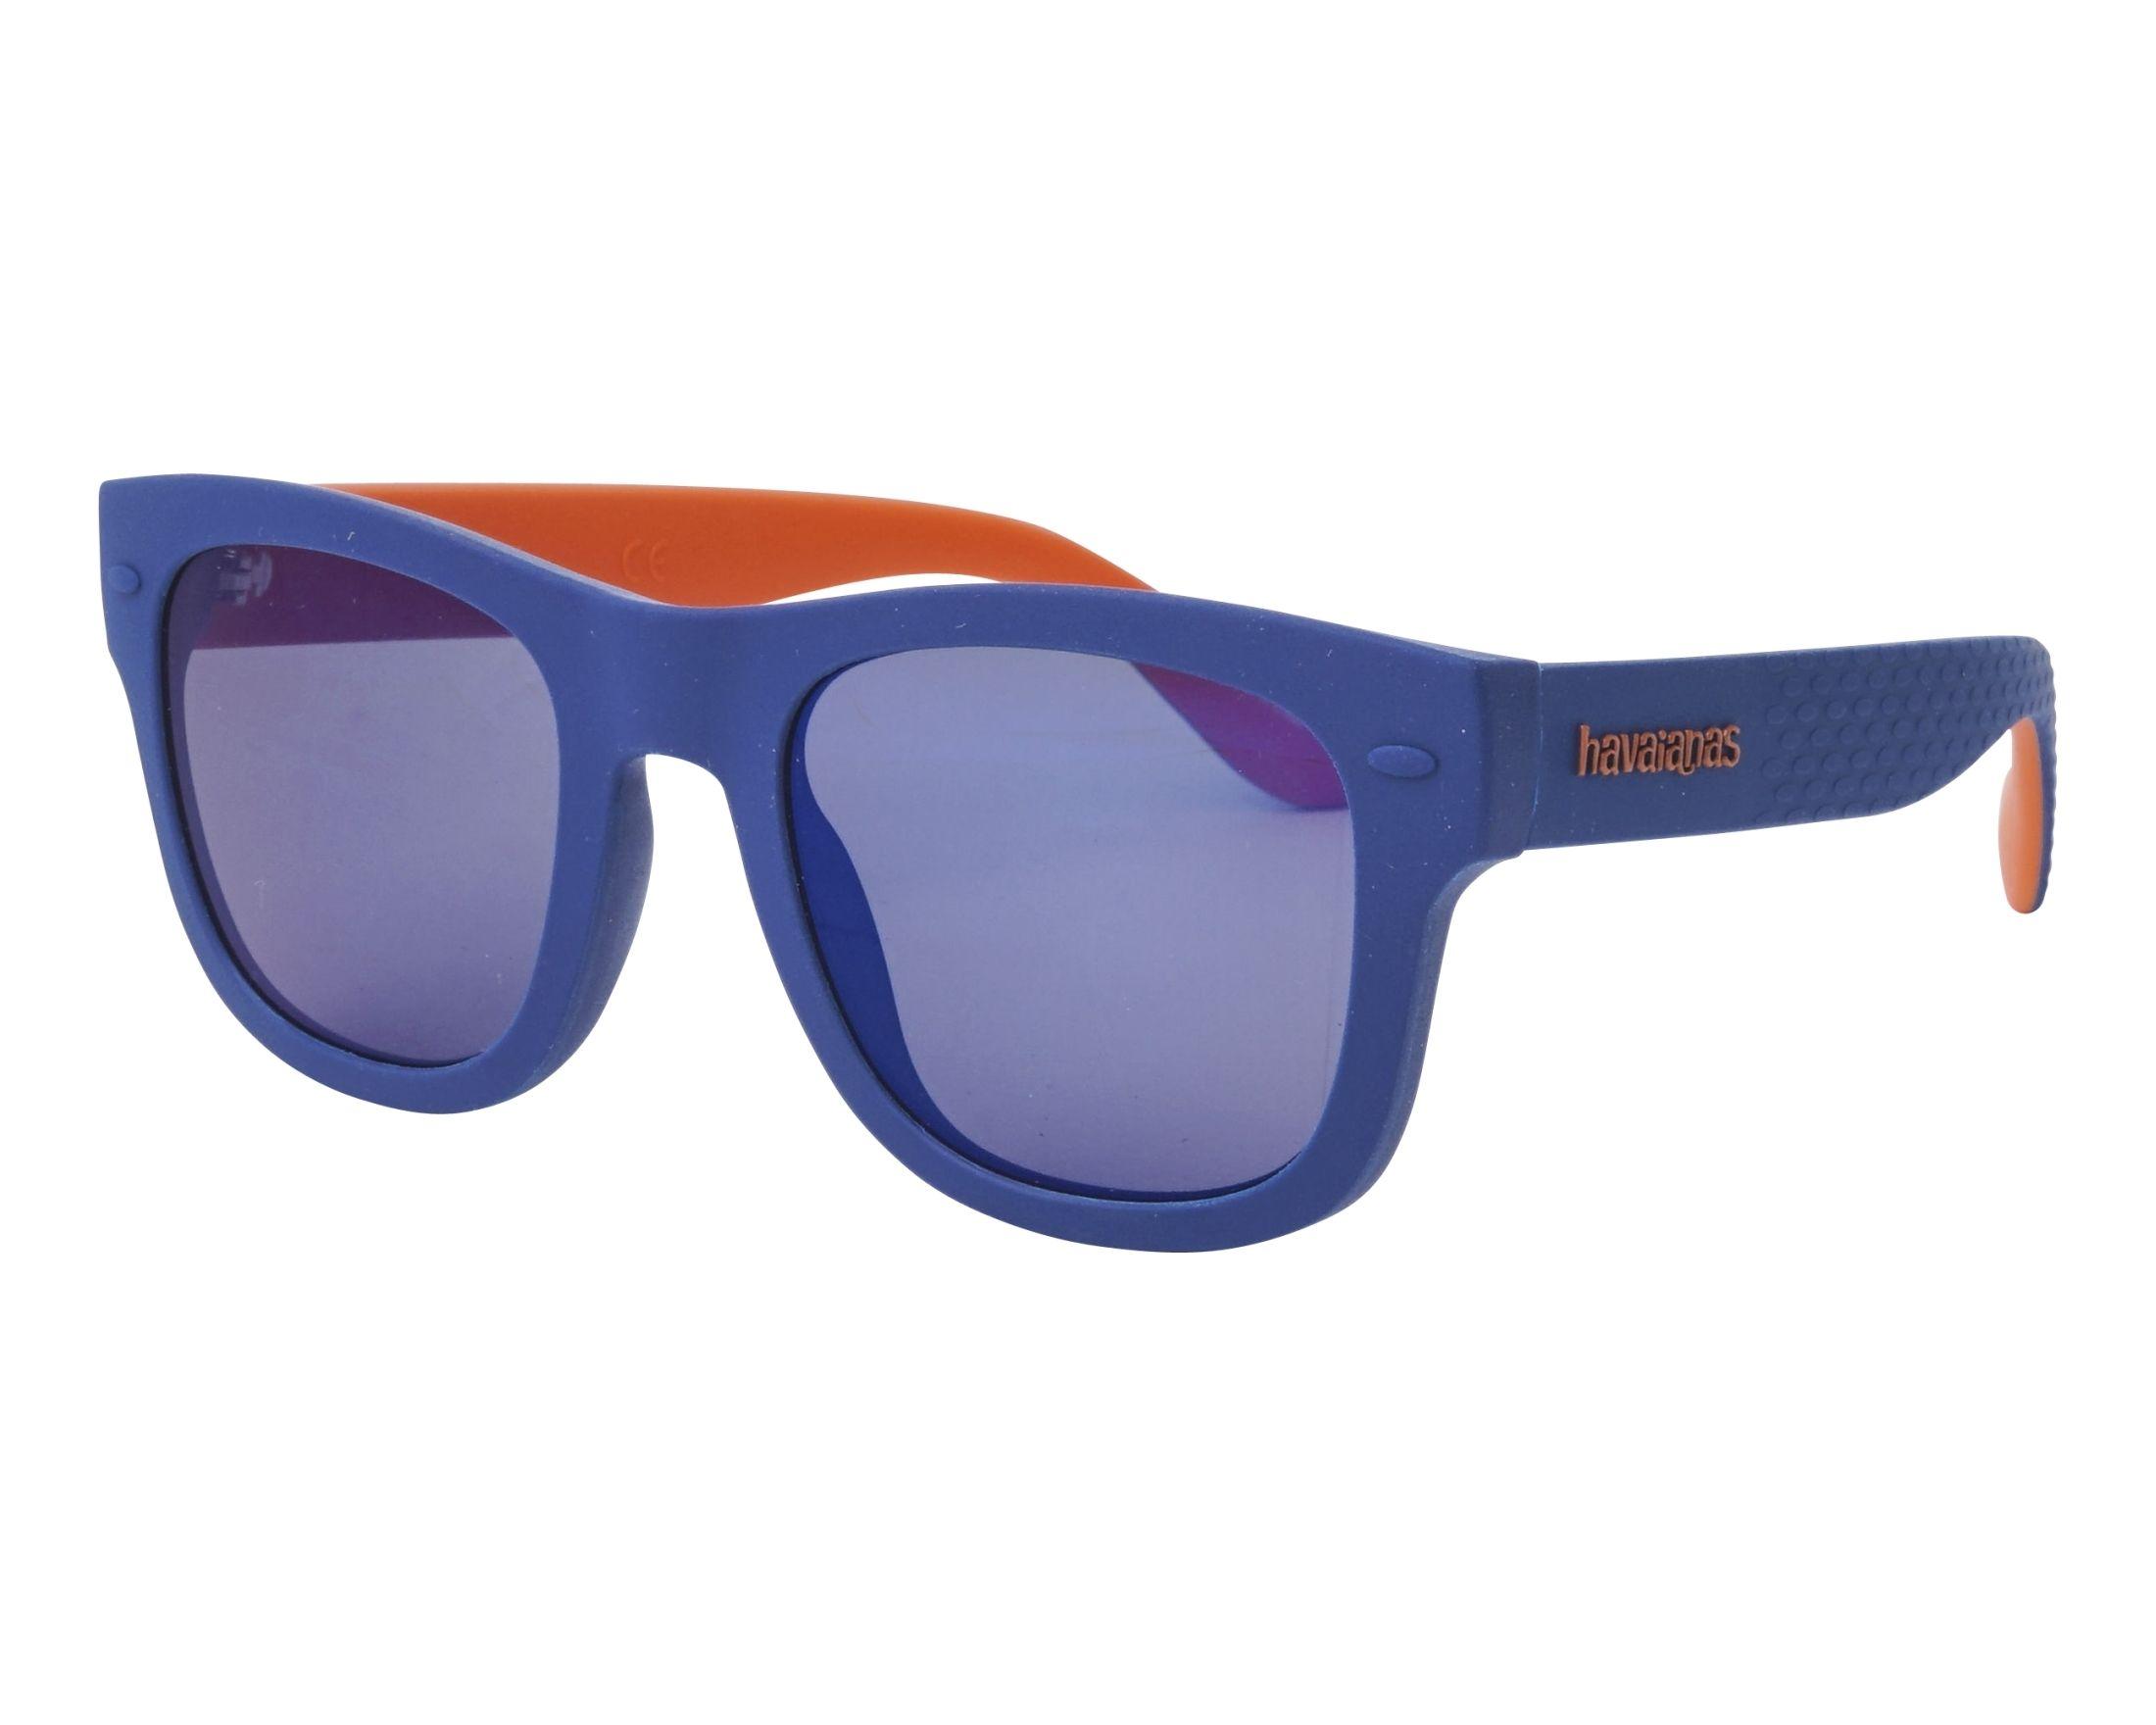 832b9e8537b16 Gafas de sol Havaianas PARATY-M RTCXT 50-21 Azul Naranja vista de perfil